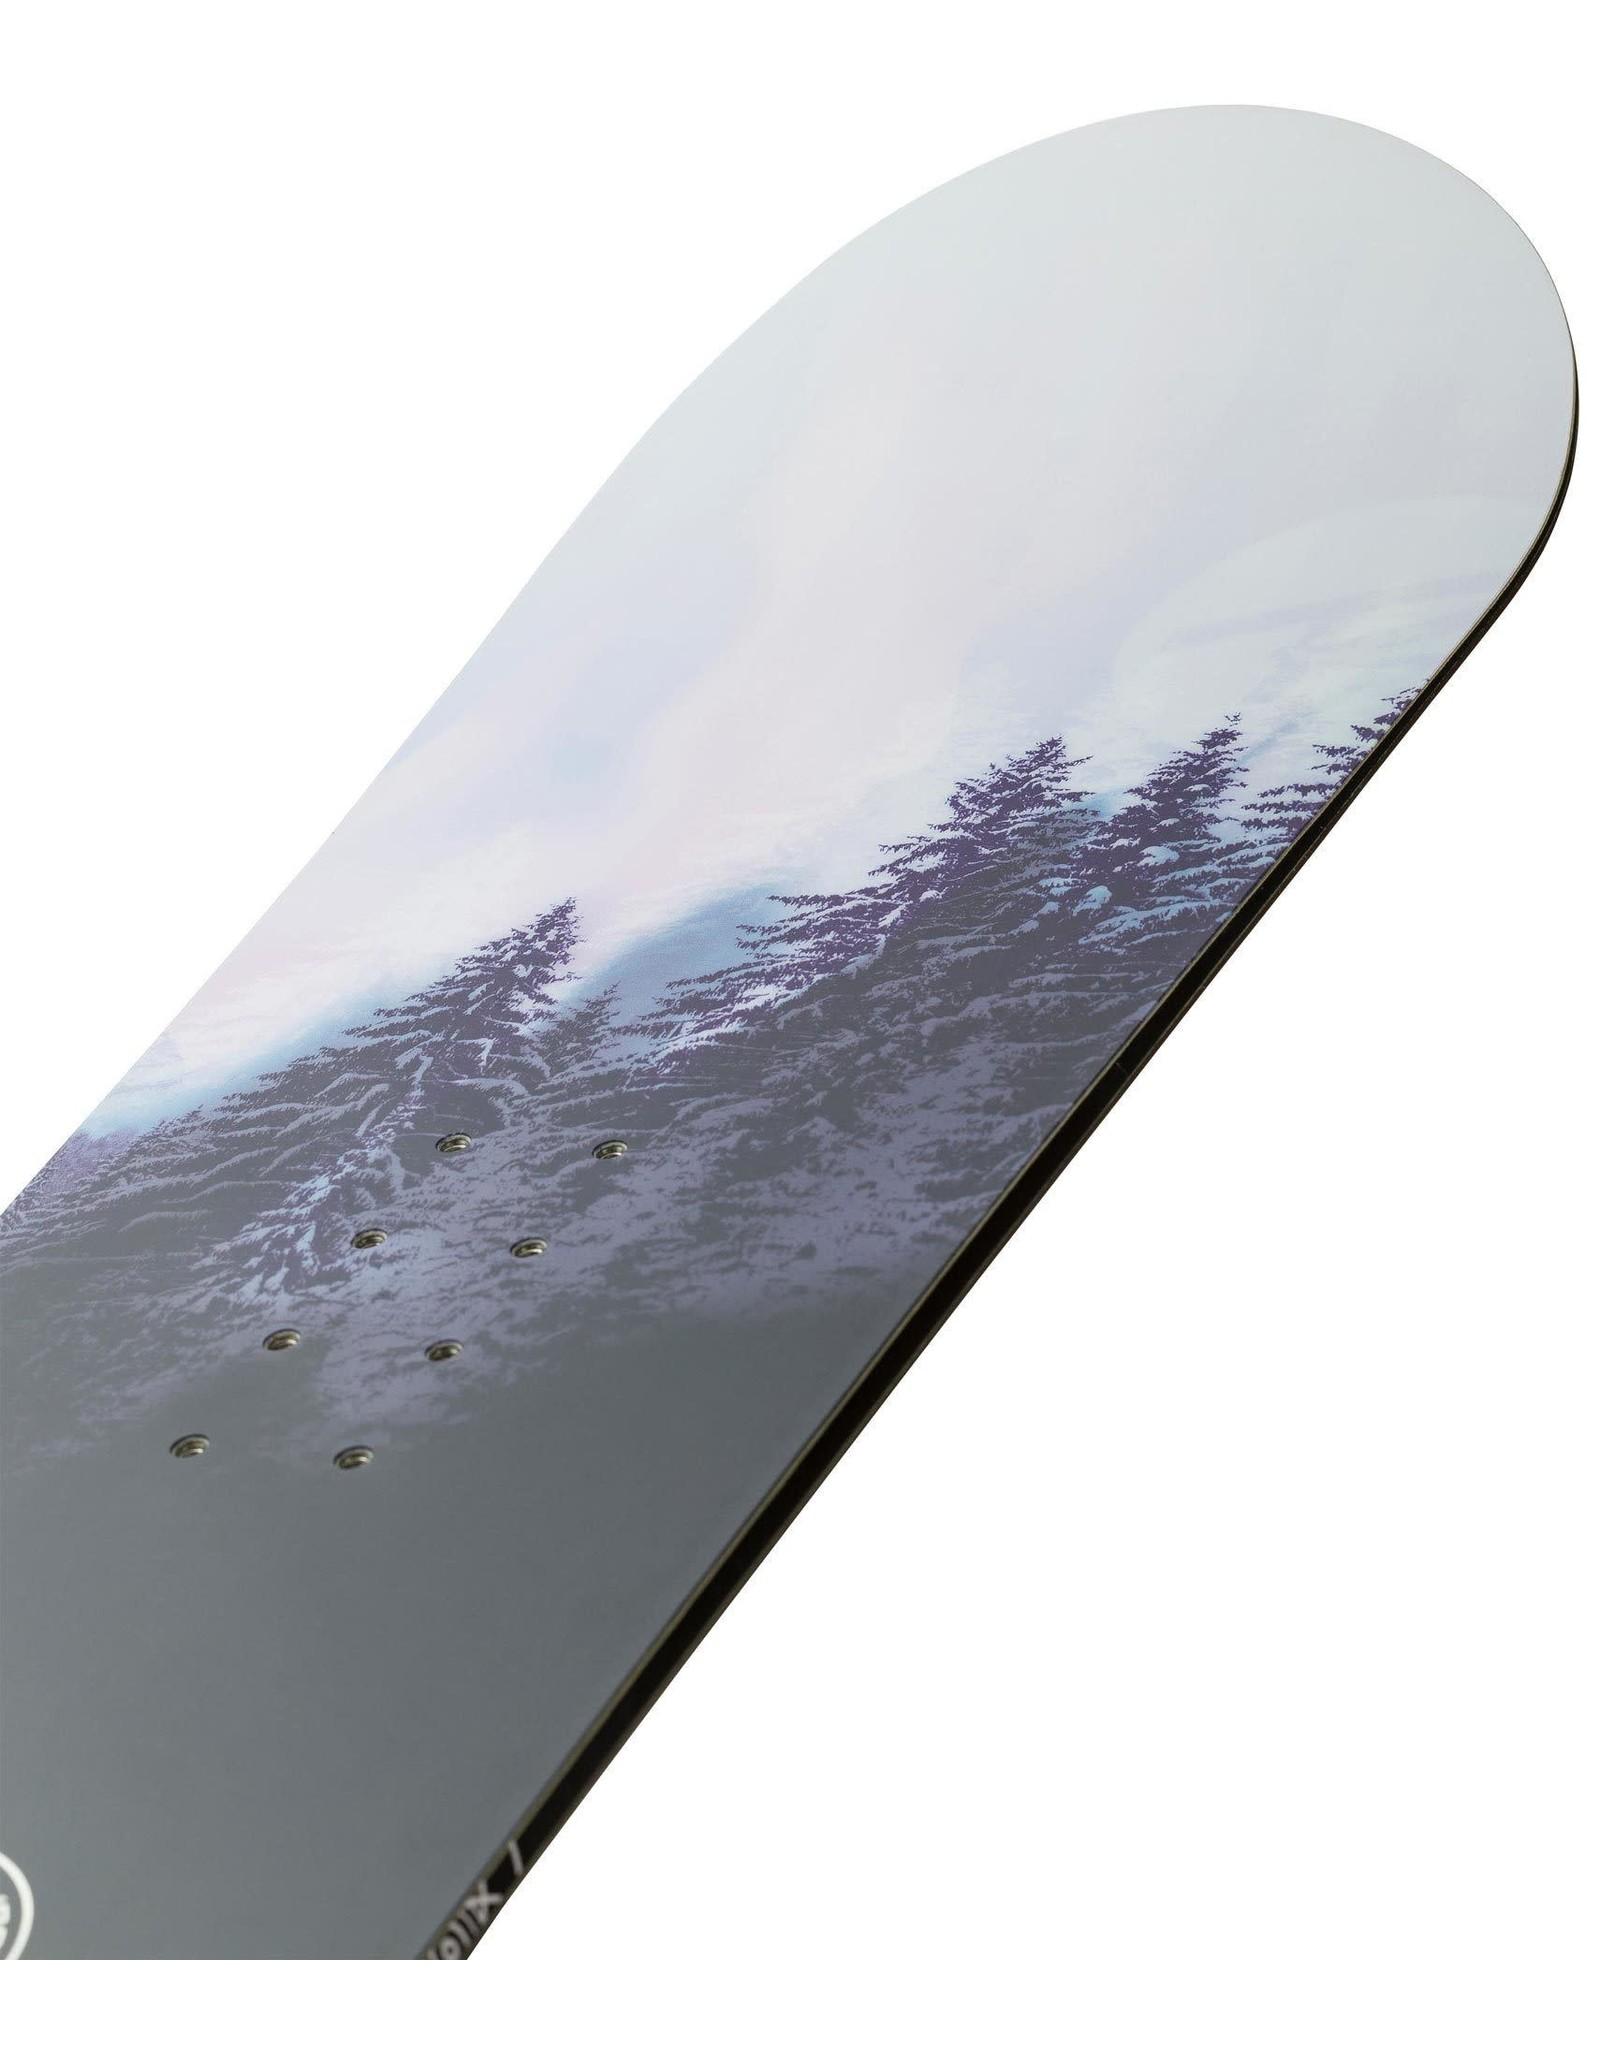 ROSSIGNOL ROSSIGNOL GALA  SNOWBOARD SR 20